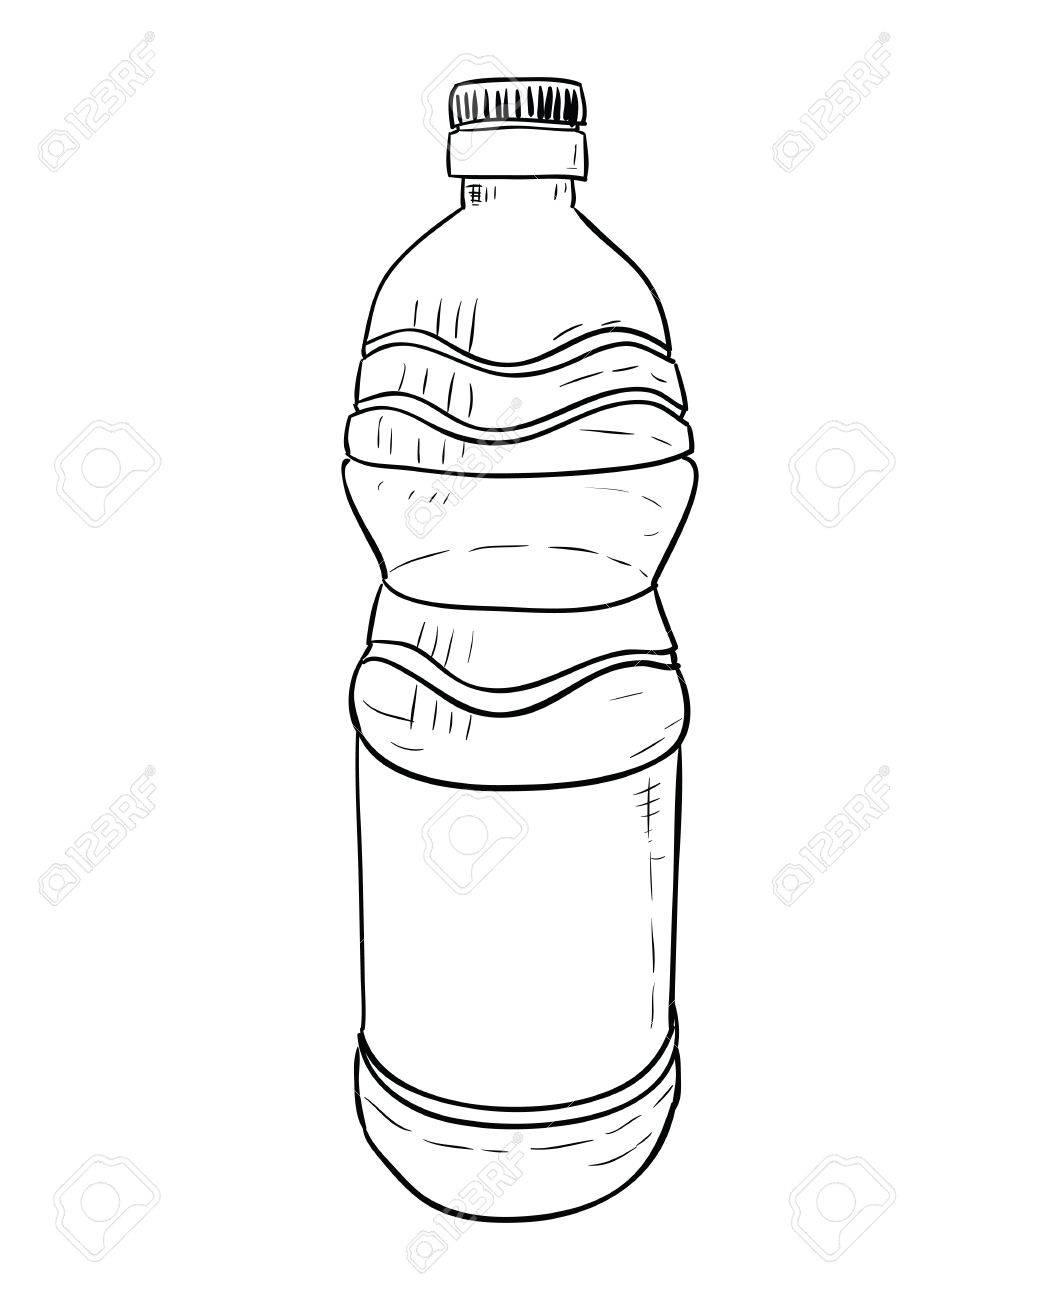 1040x1300 Vector Sketch Of Plastic Bottle. Hand Draw Illustration. Royalty